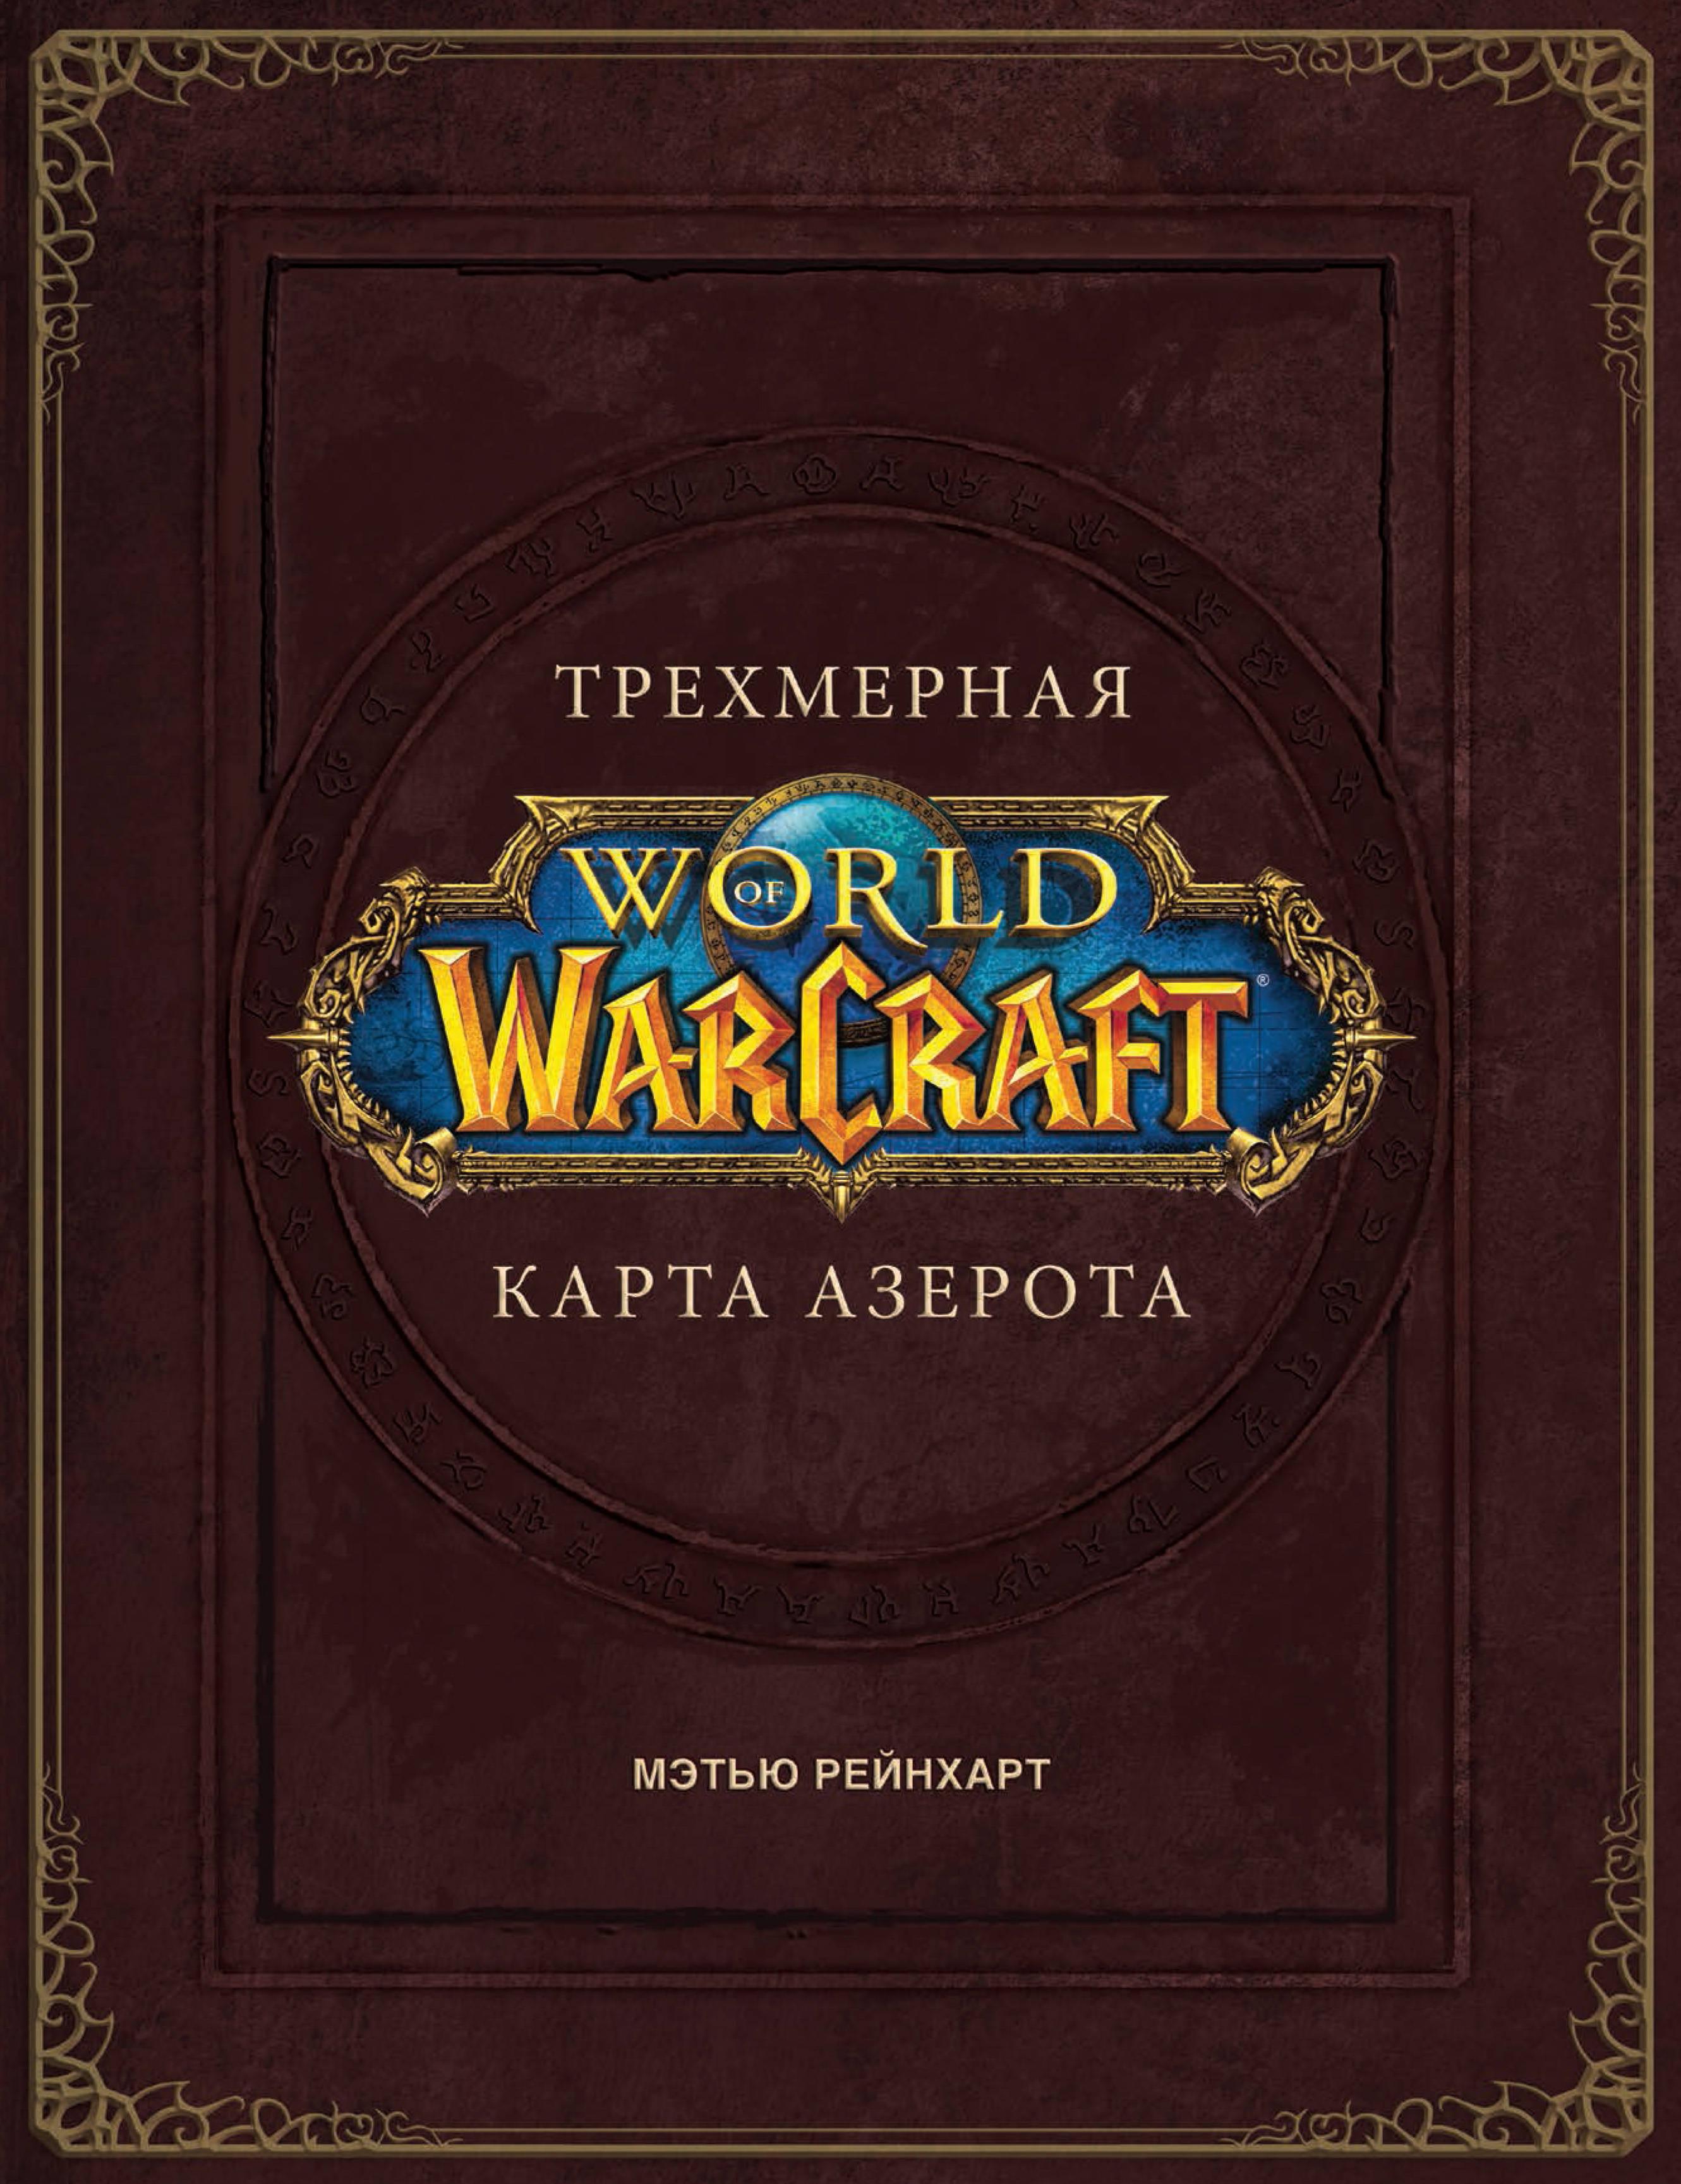 Брукс Роберт World of Warcraft. Трехмерная карта Азерота